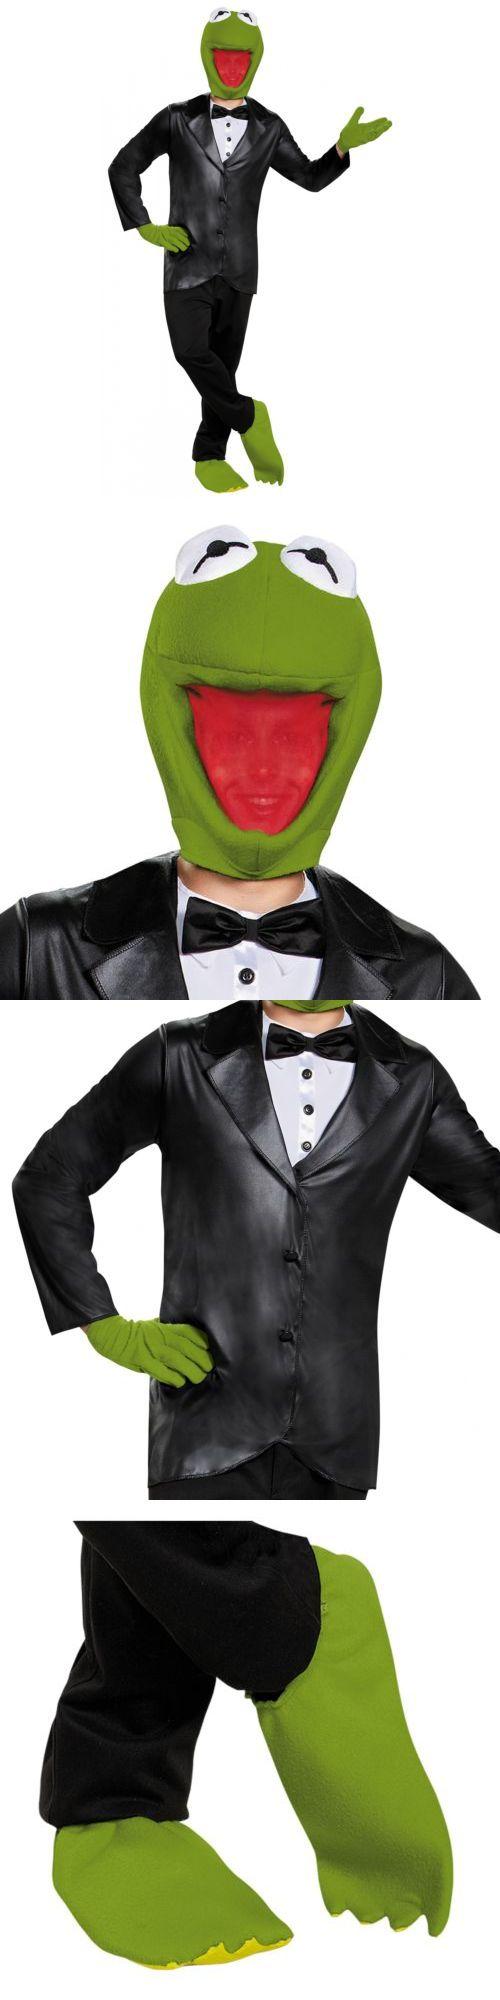 Men Costumes: Kermit The Frog Costume Adult Muppets Halloween Fancy Dress -> BUY IT NOW ONLY: $45.69 on eBay!